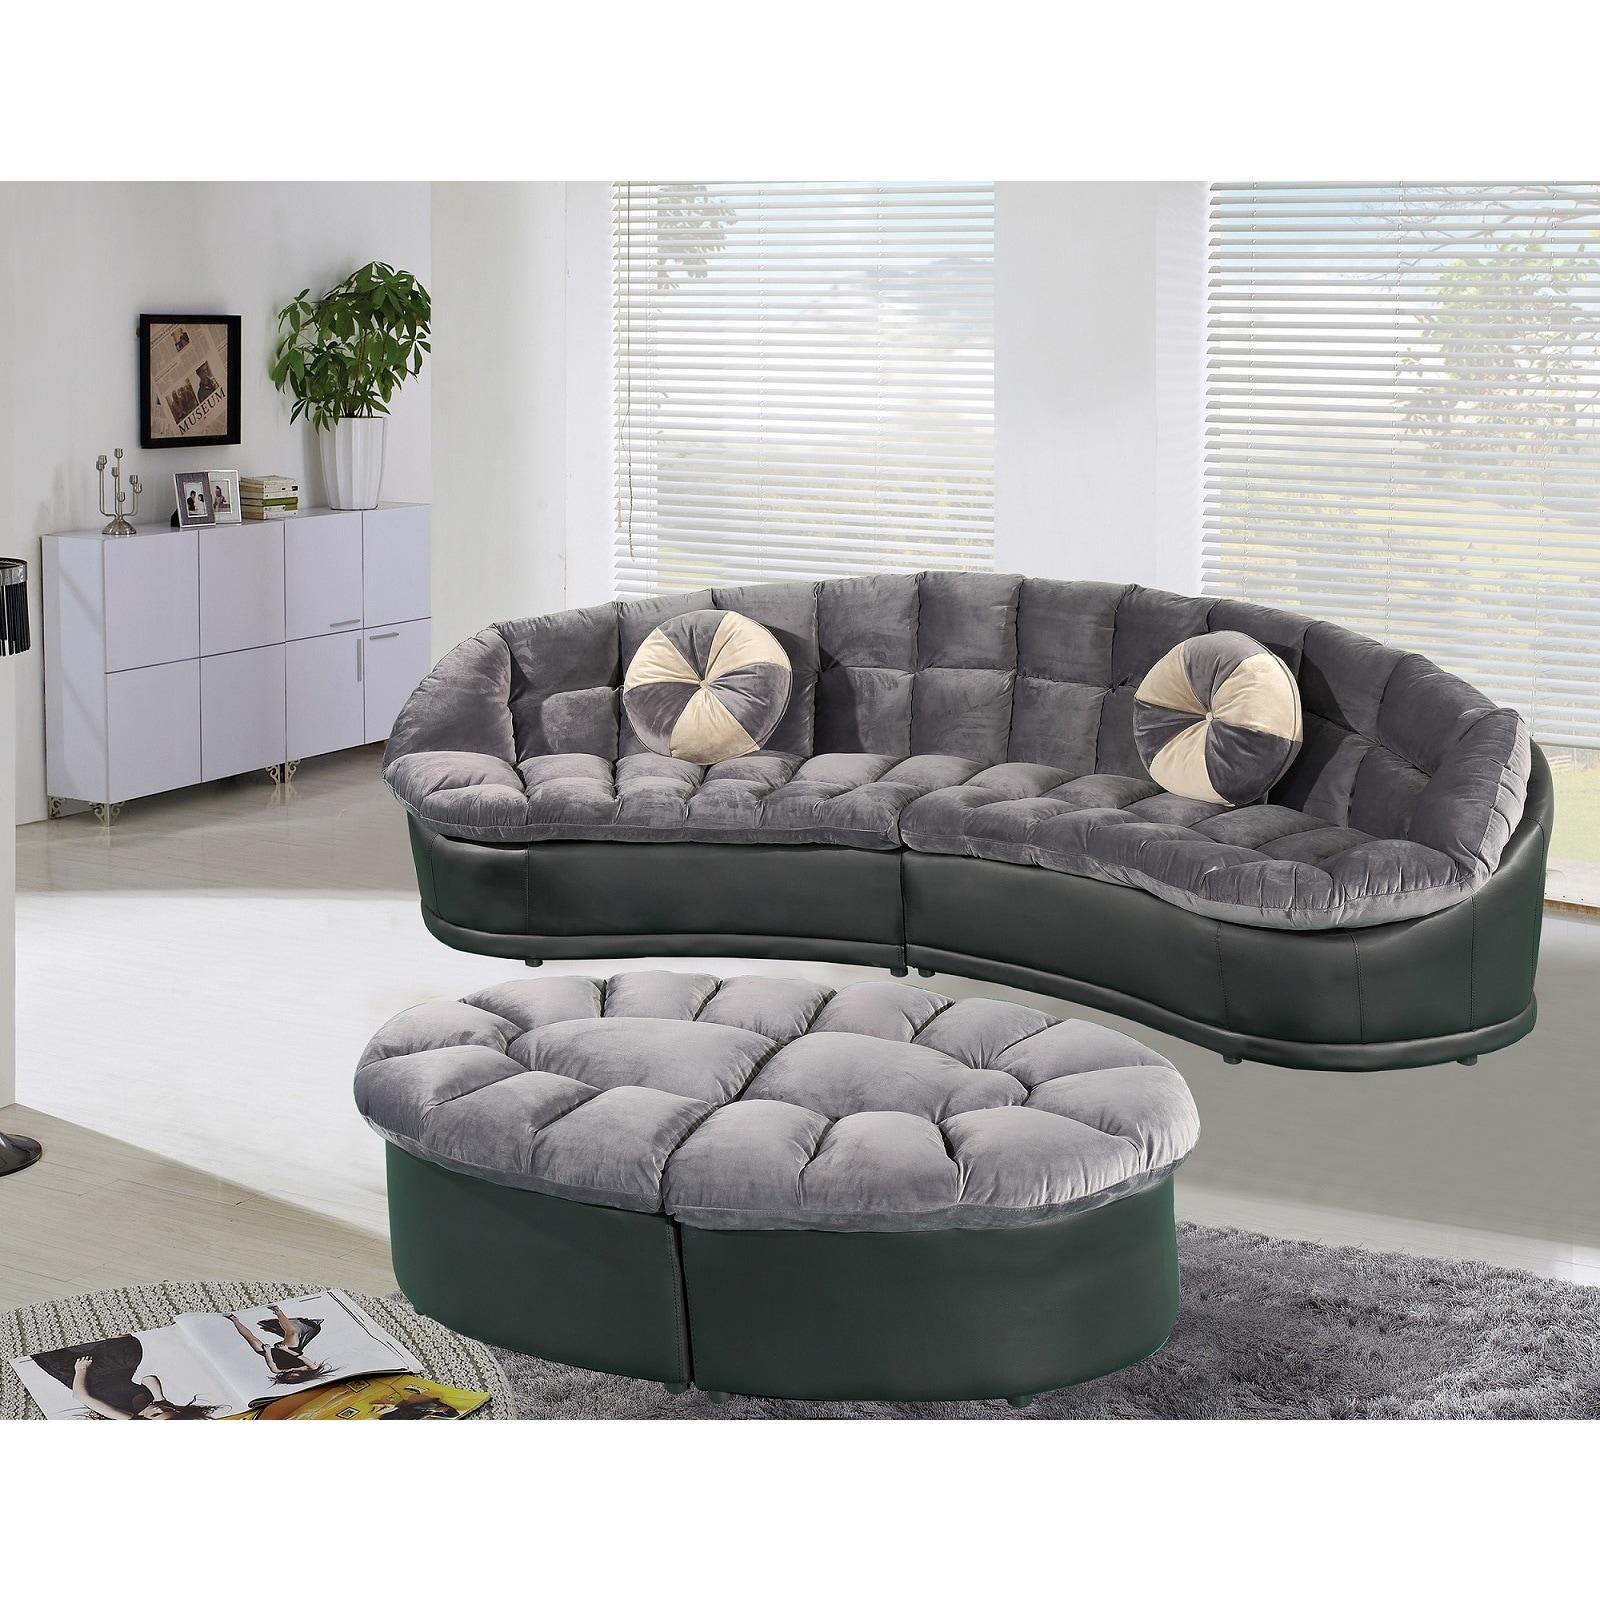 Papasan Modernstyle Velvet 2piece Sectional Sofa with Ottoman Set